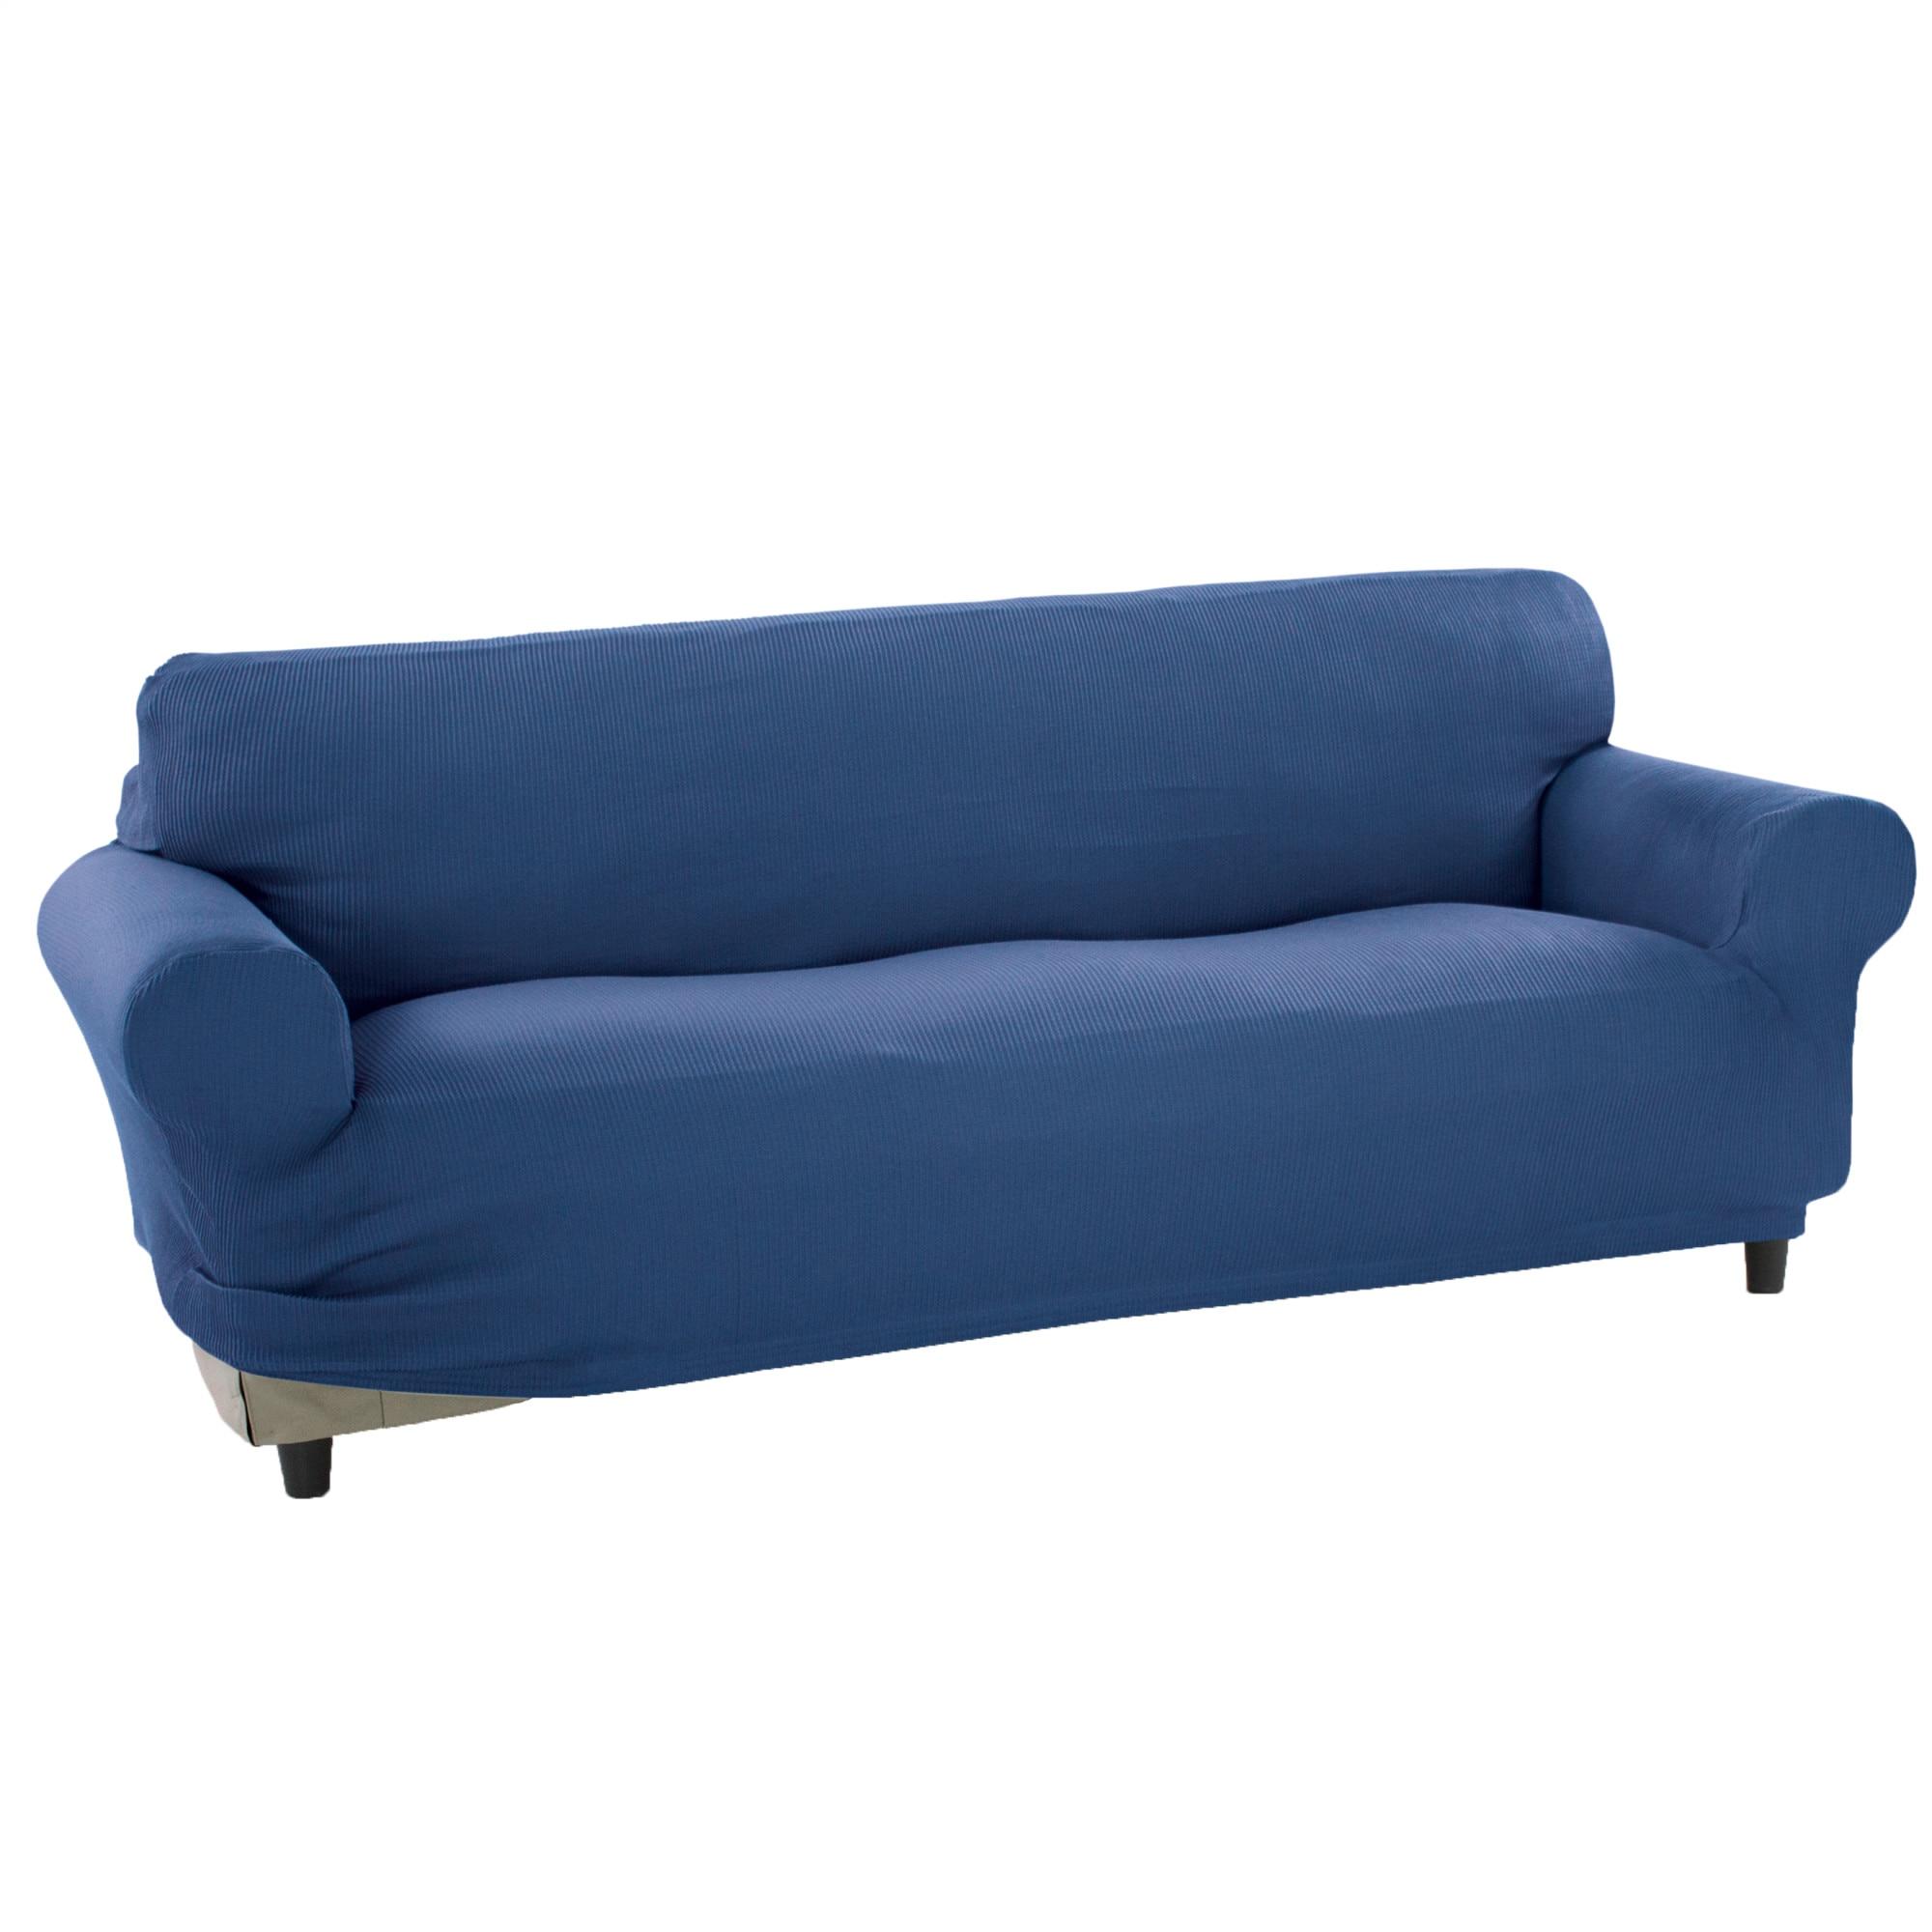 Fotografie Husa elastica pentru canapea 3 locuri Kring Nairobi, intre 180-220 cm, 60% bumbac+ 35% poliester + 5% elastan, Albastru